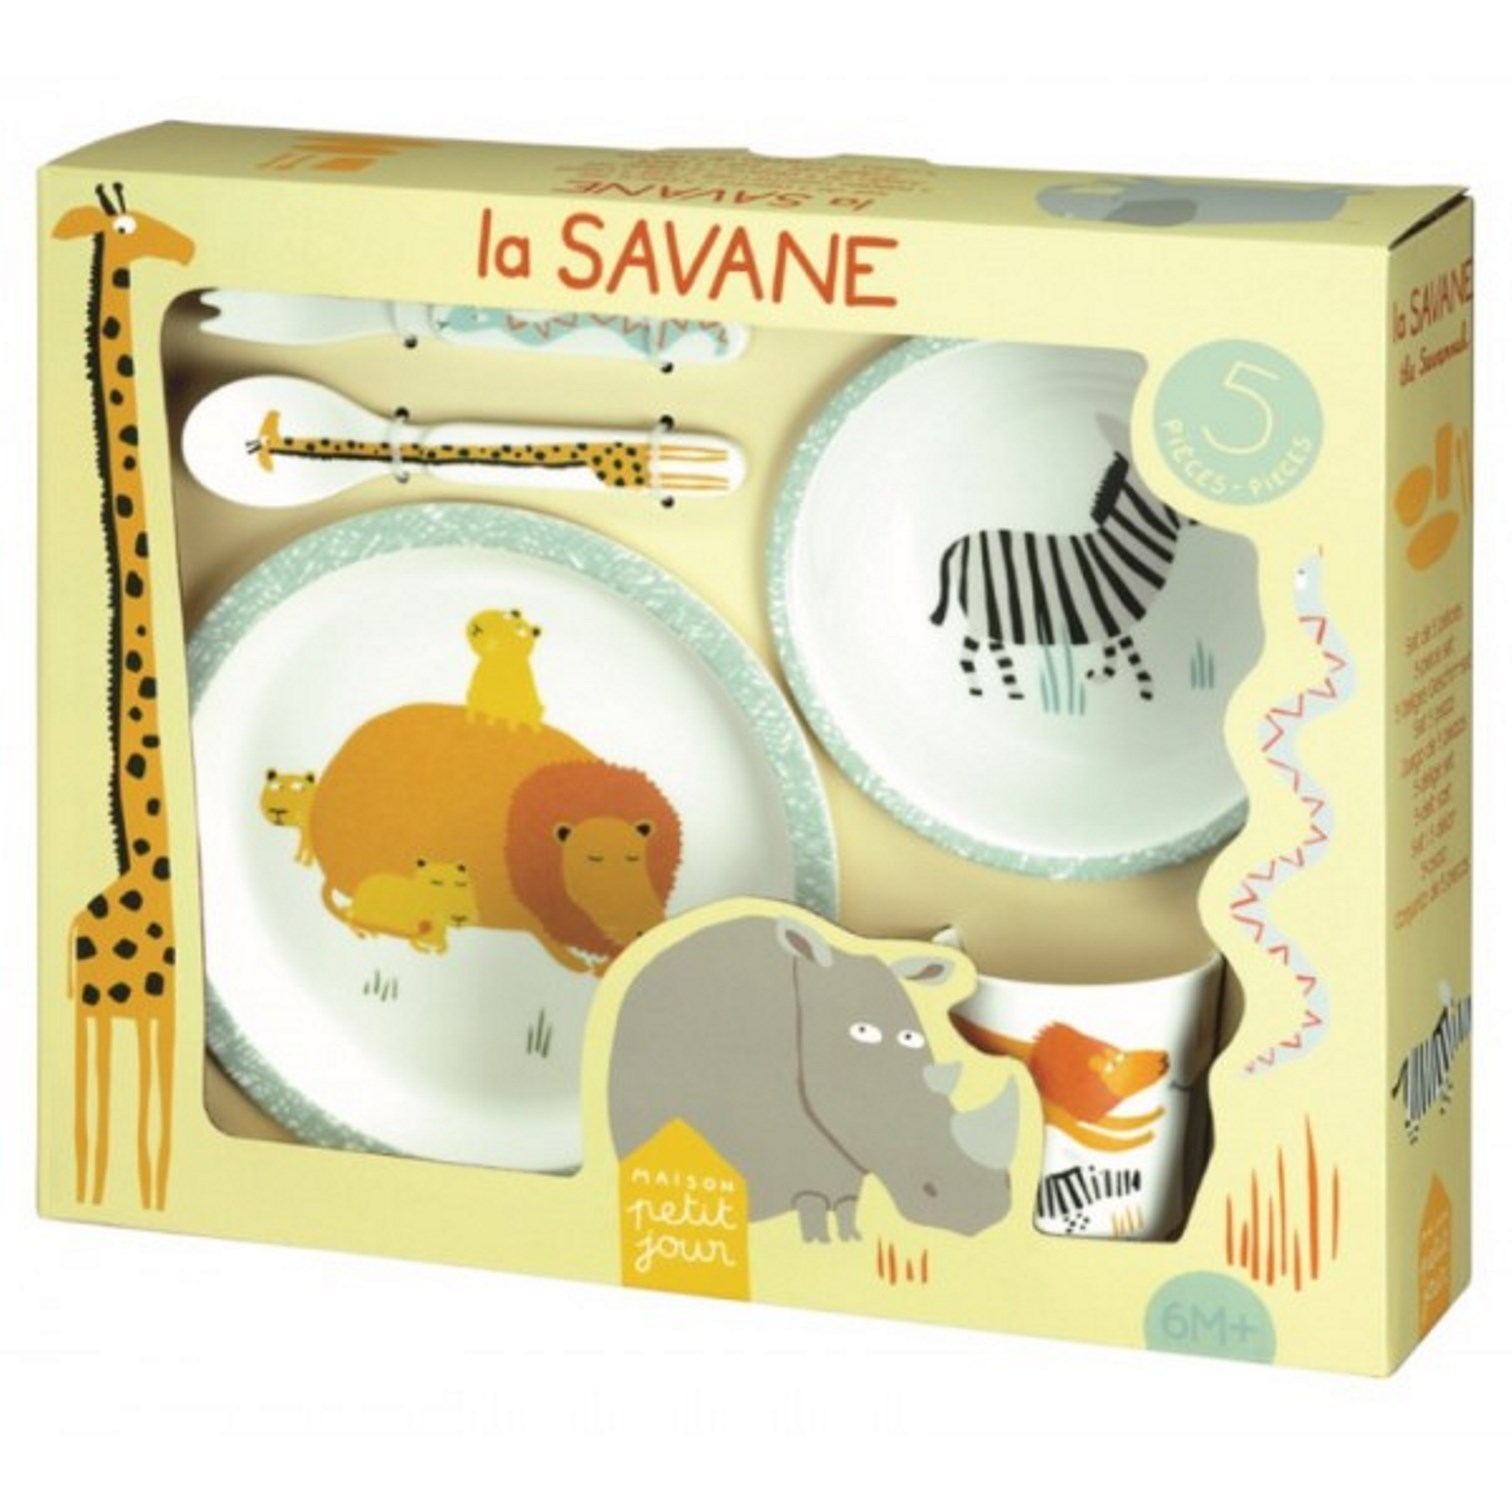 "Онлайн каталог PROMENU: Набор детский ""Животные"" (тарелка, пиала, стакан, ложка, вилка) Maison Petit Jour SAVANNAH, 33,5x27x7 см, белый, 5 предметов Maison Petit Jour SA701N"